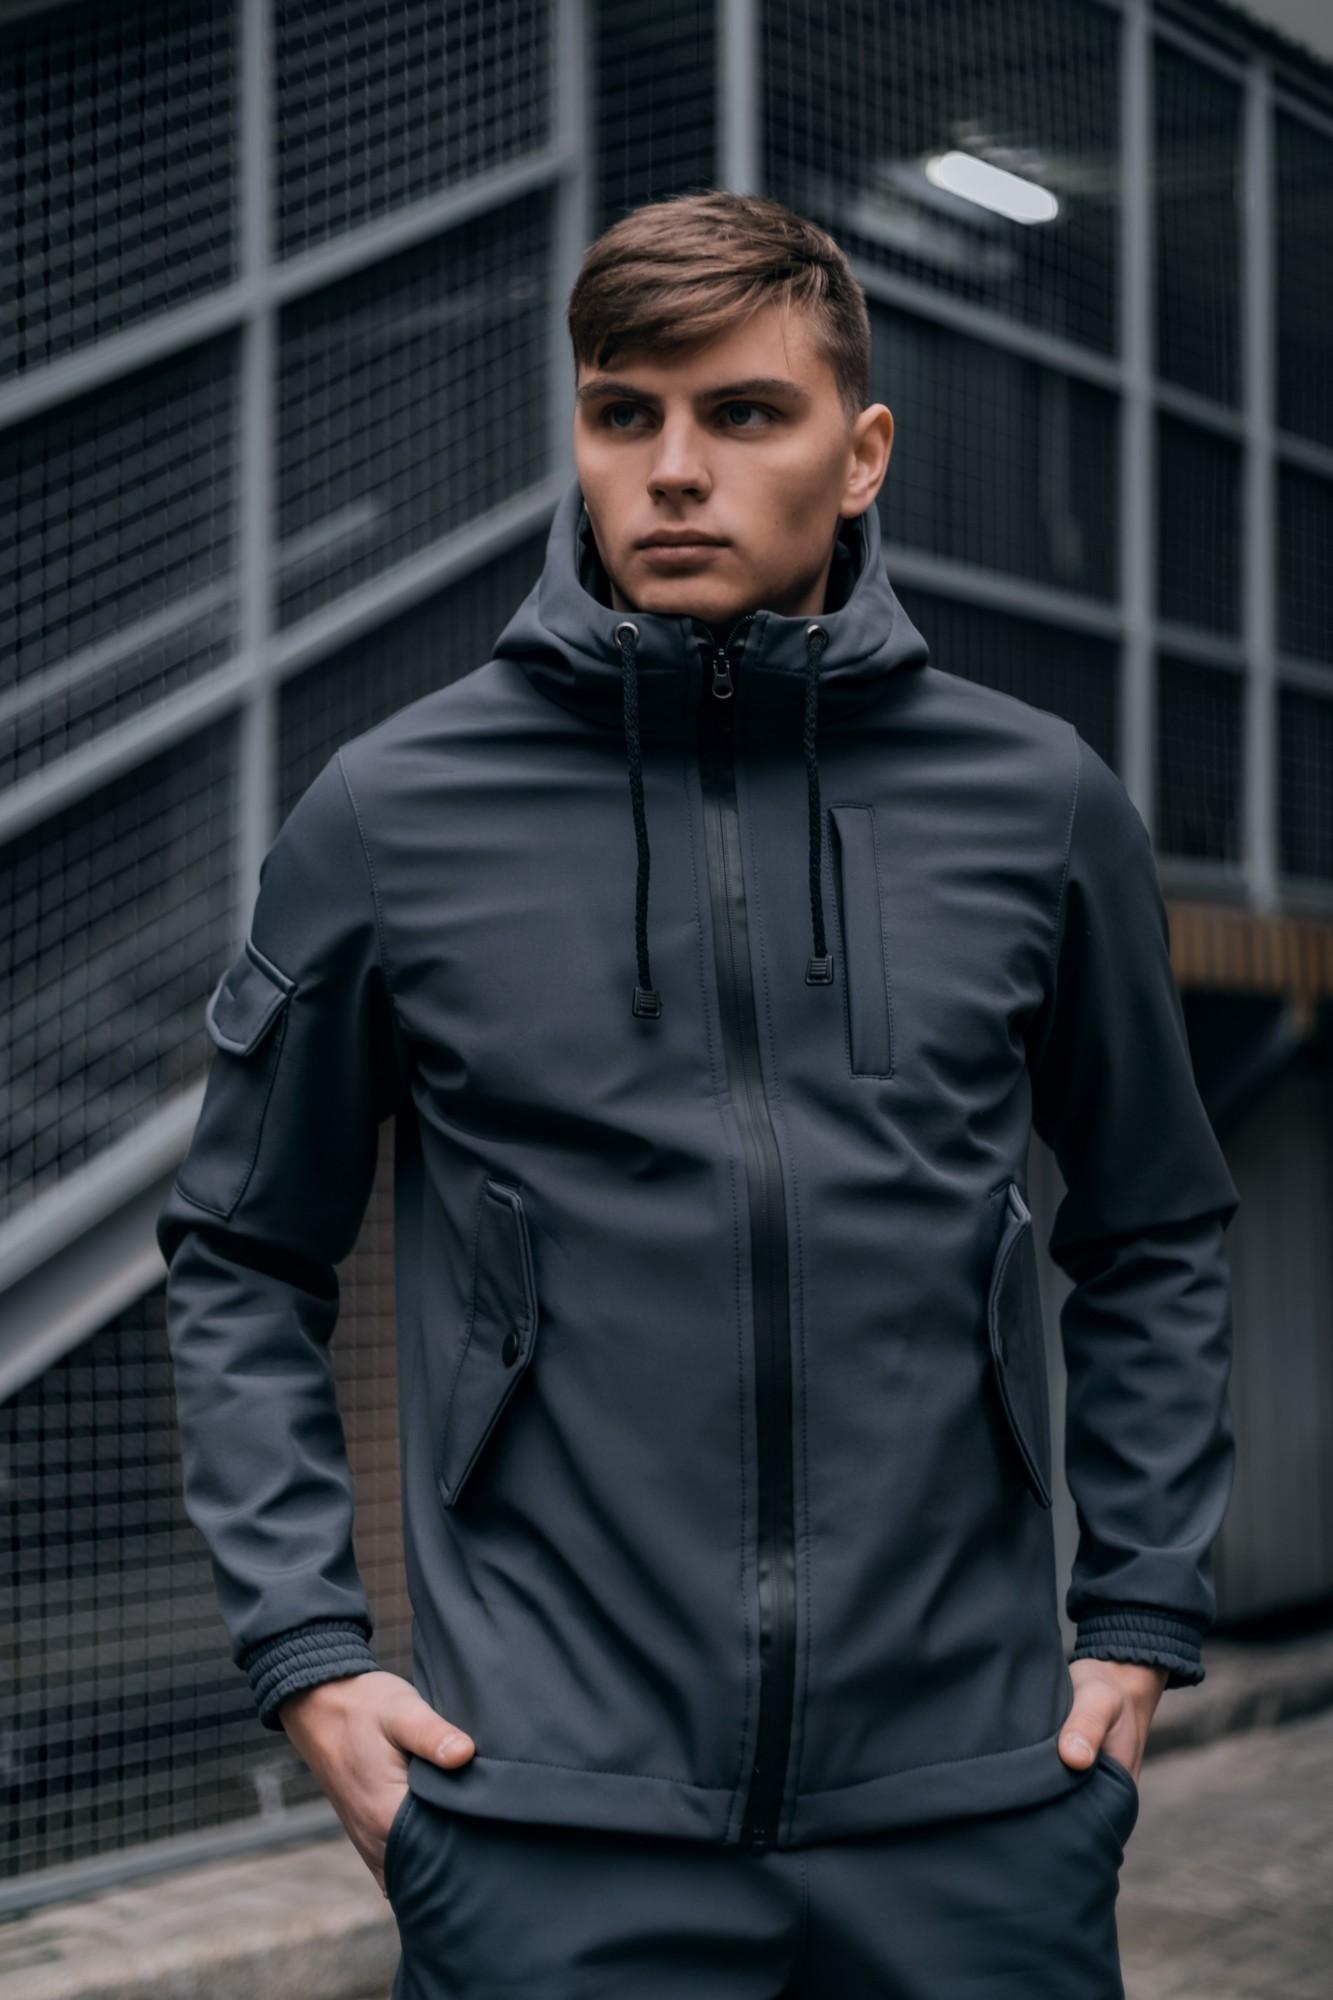 Мужская демисезонная куртка Intruder SoftShell серый S Intruder